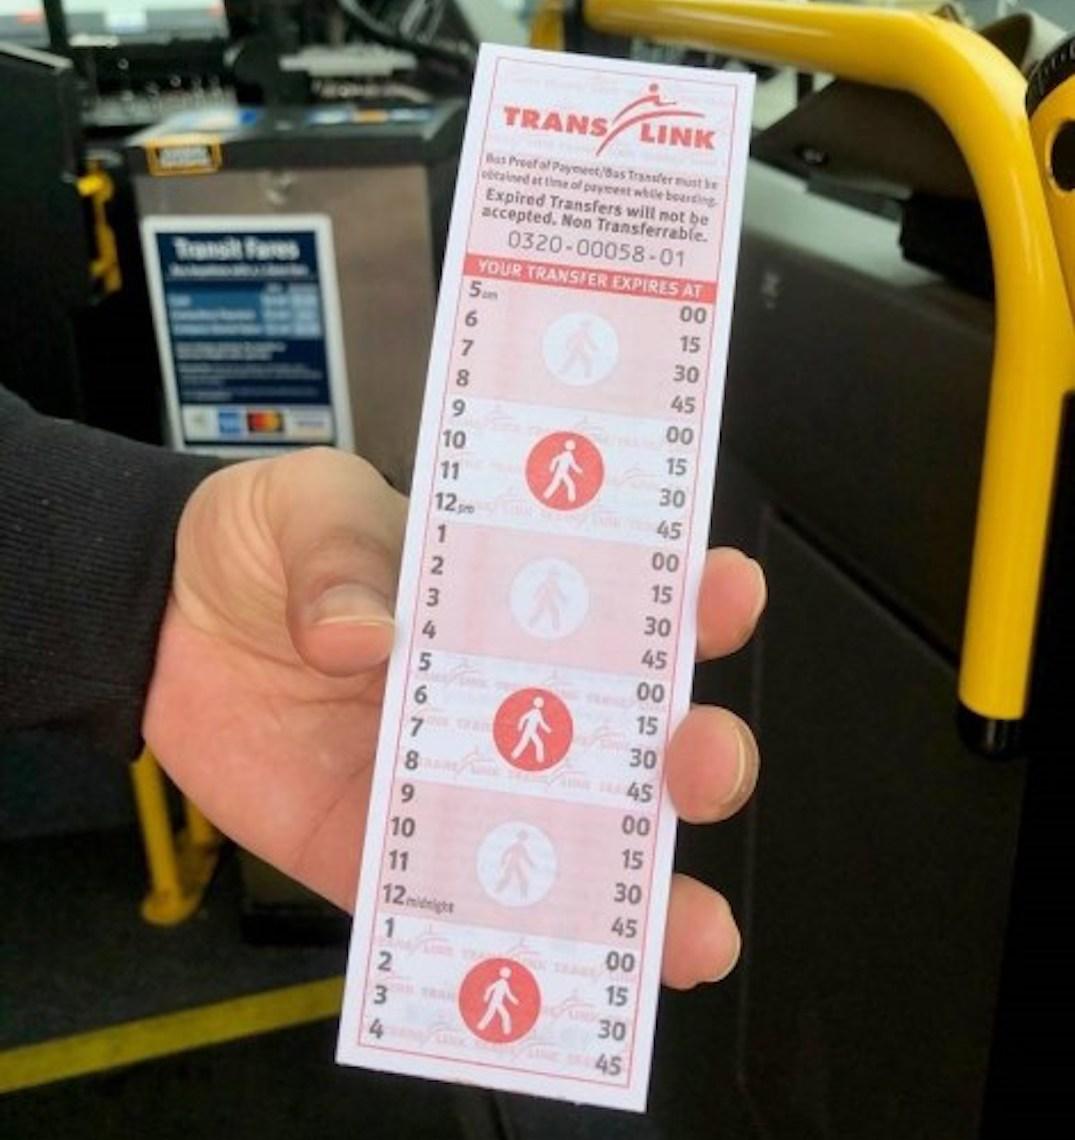 paper transfer tickets translink 2020